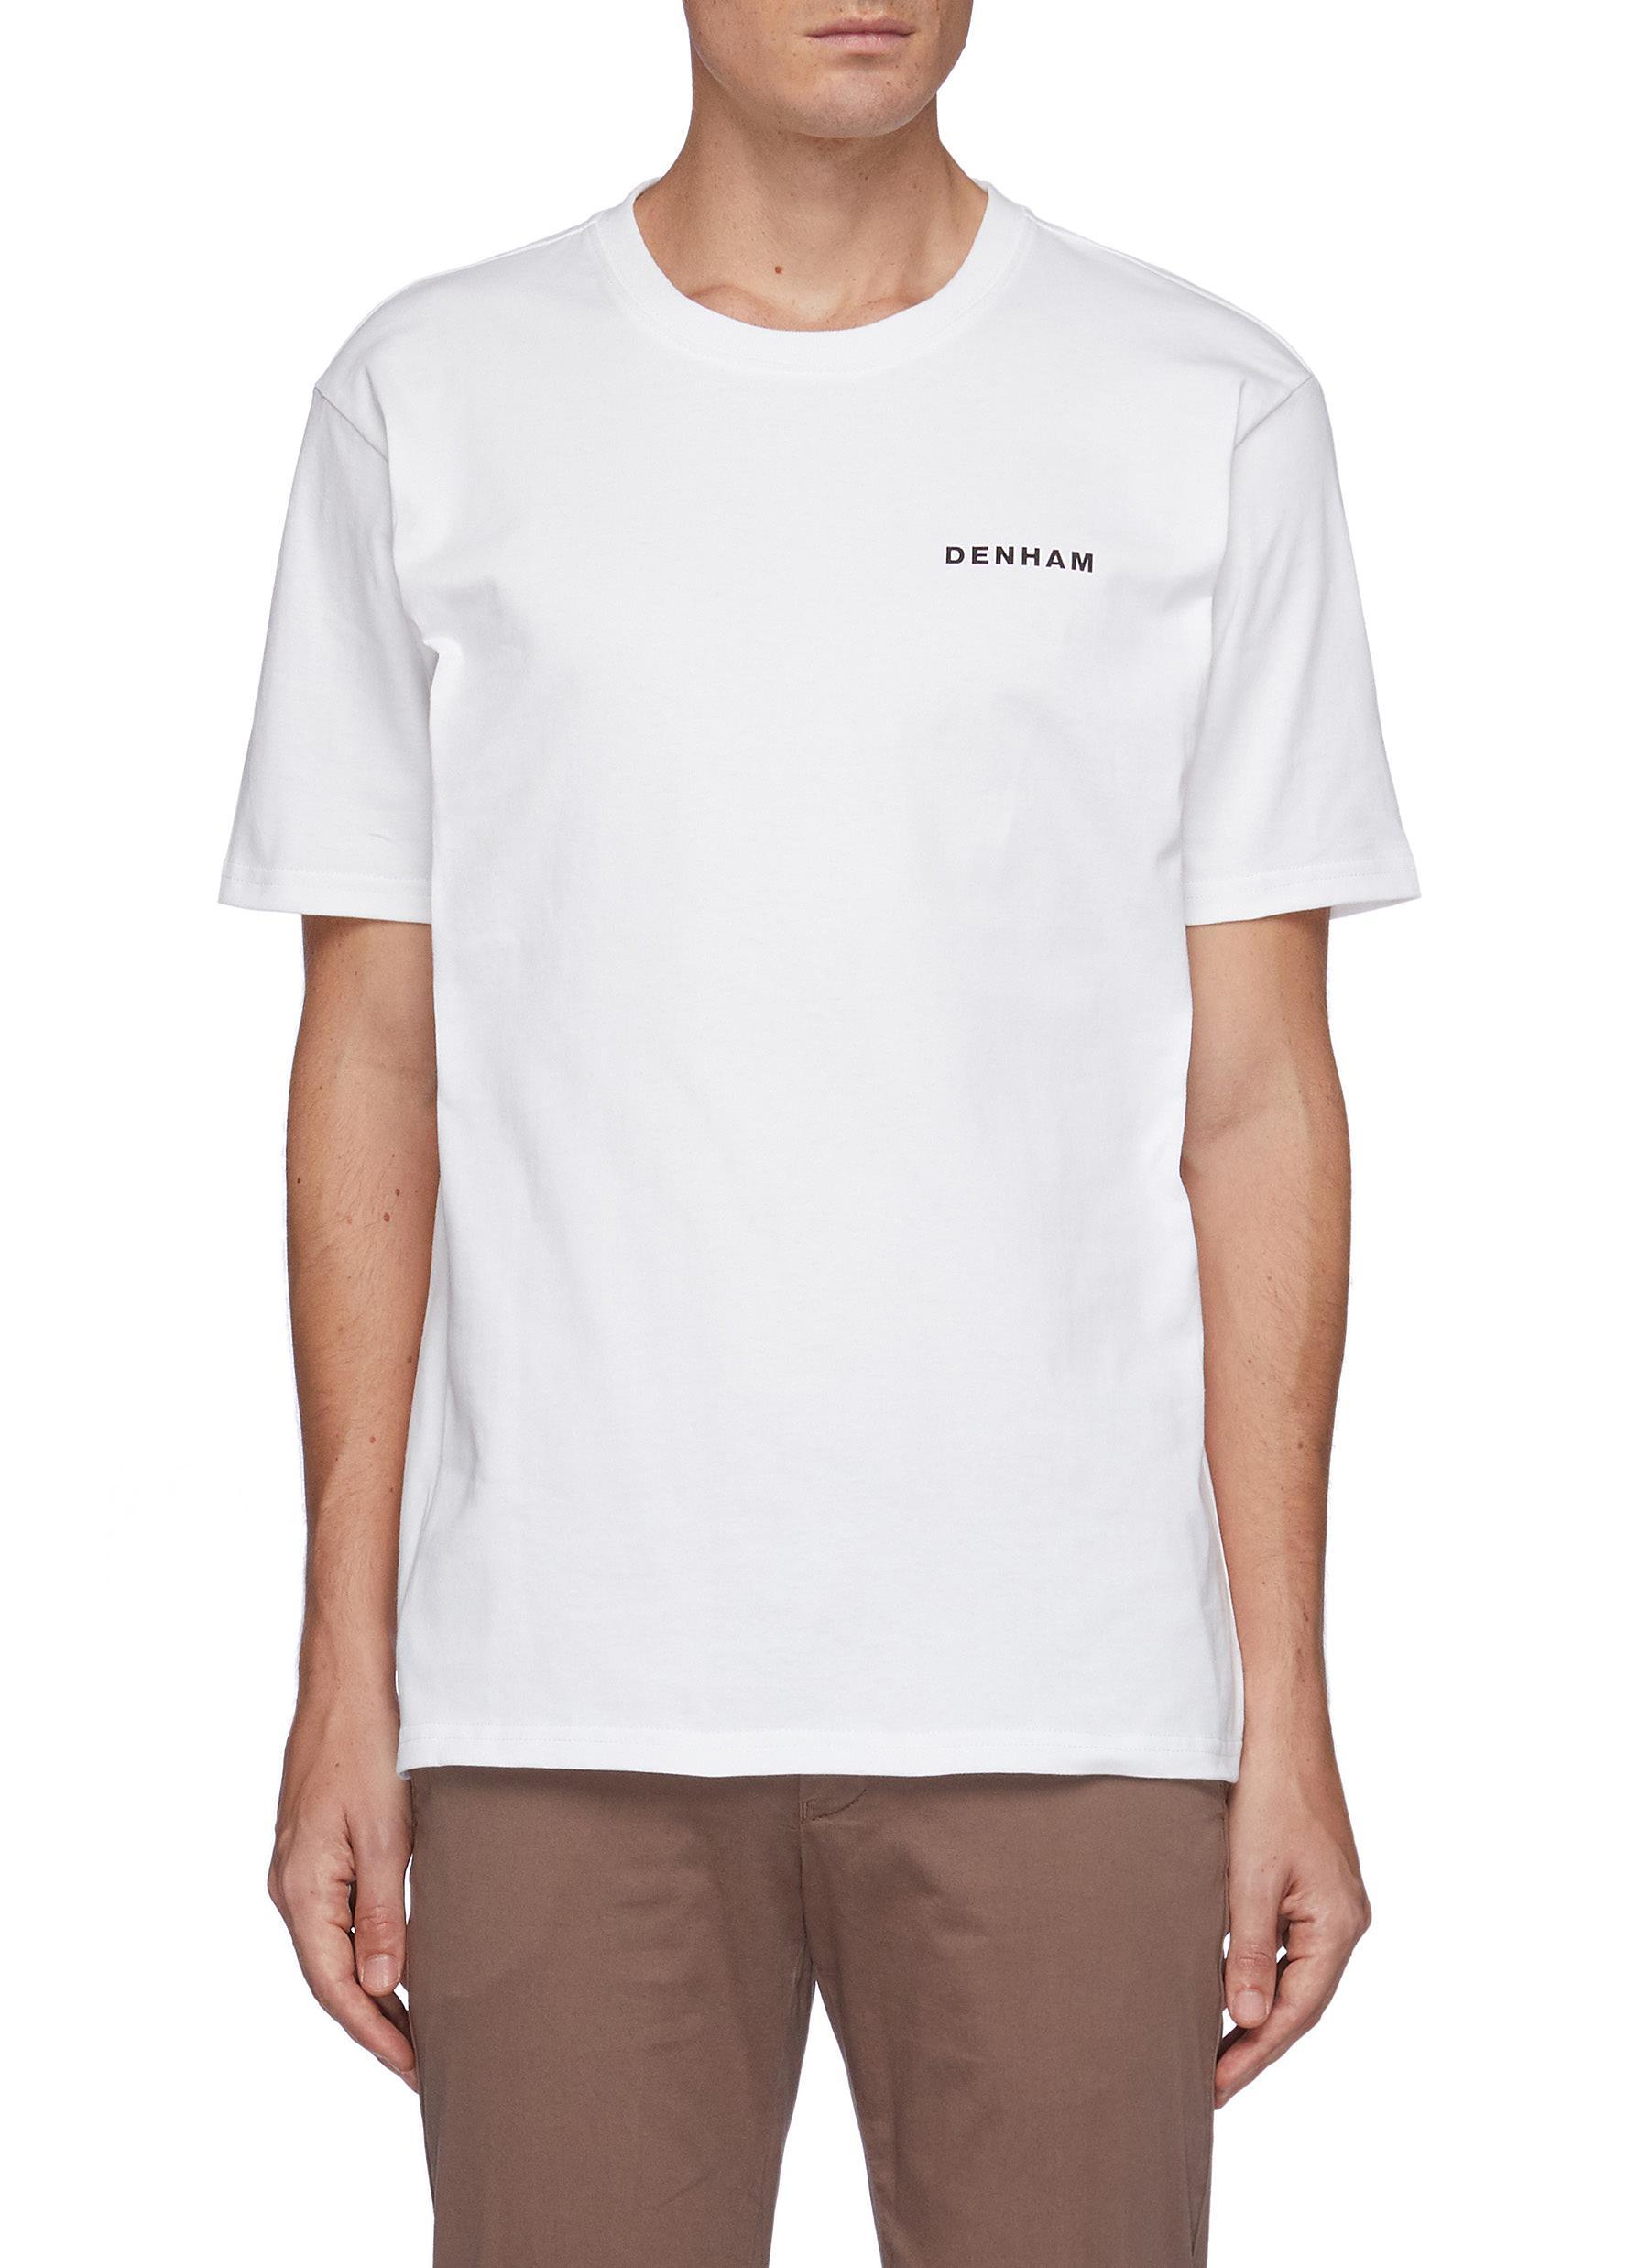 Morava' Octopus Print Cotton Crewneck T-Shirt